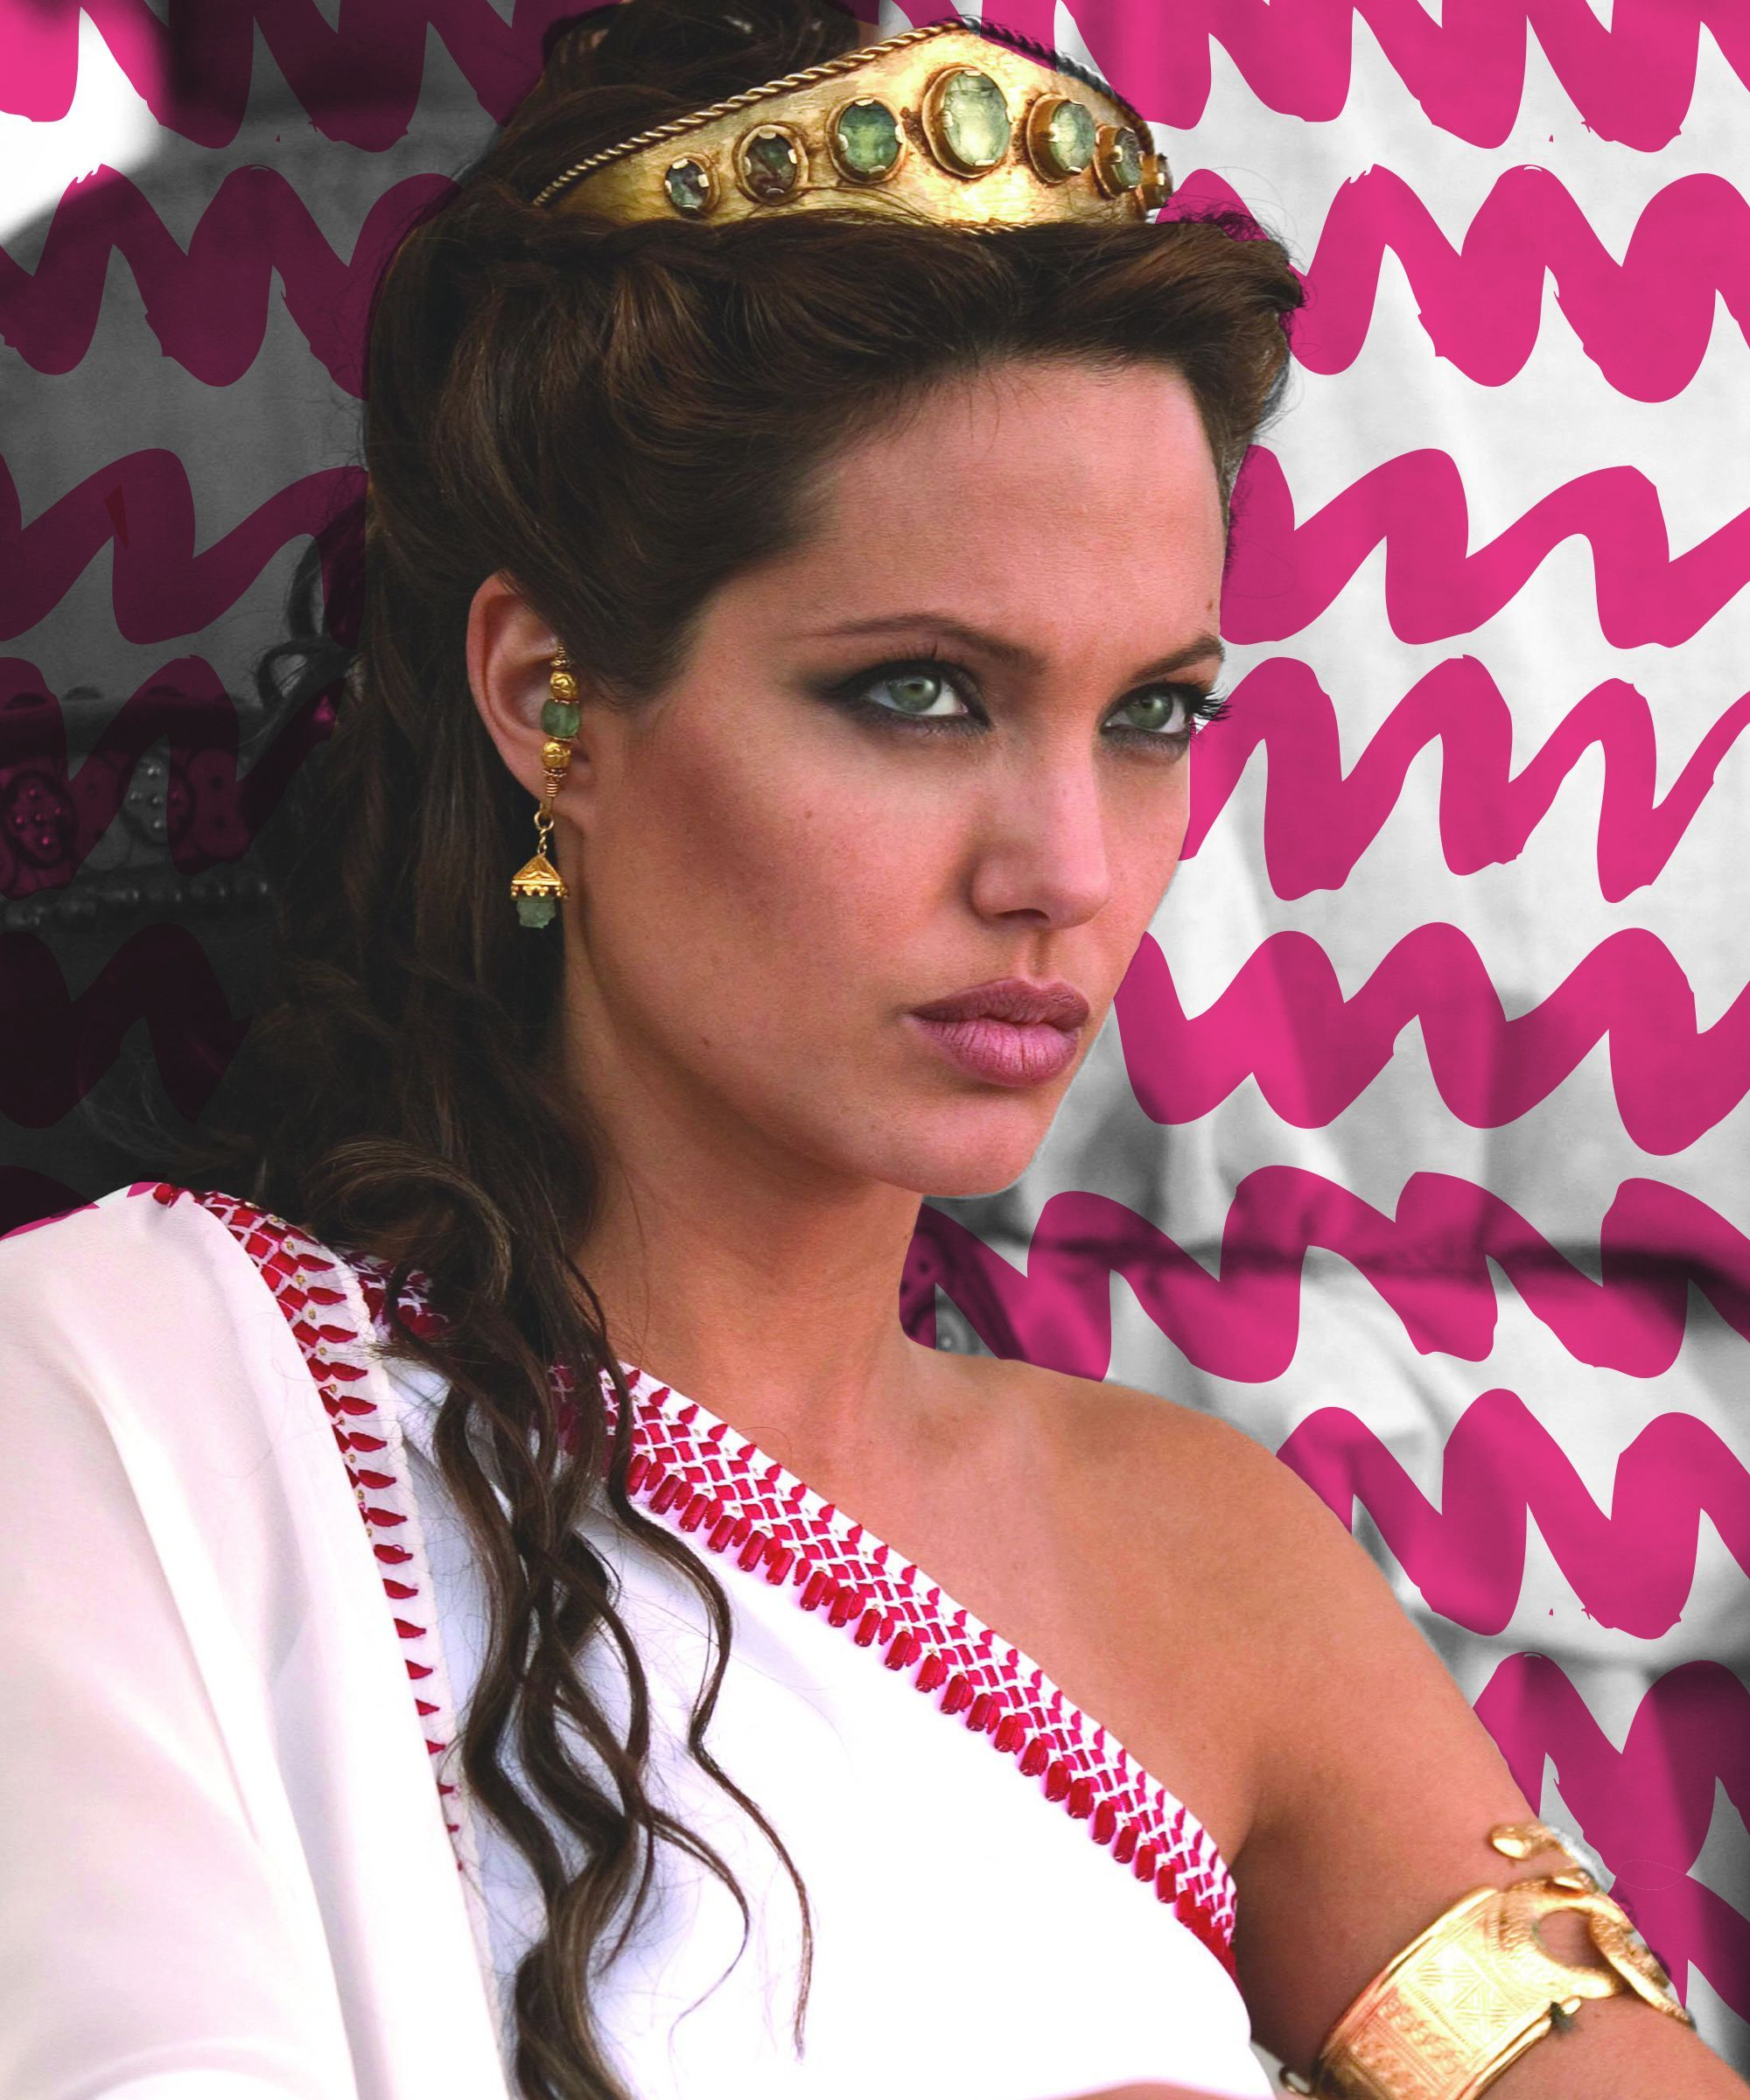 Angelina Jolie Best Worst Movie Hairstyles Intended For Angelina Jolie Short Hairstyles (Gallery 16 of 25)